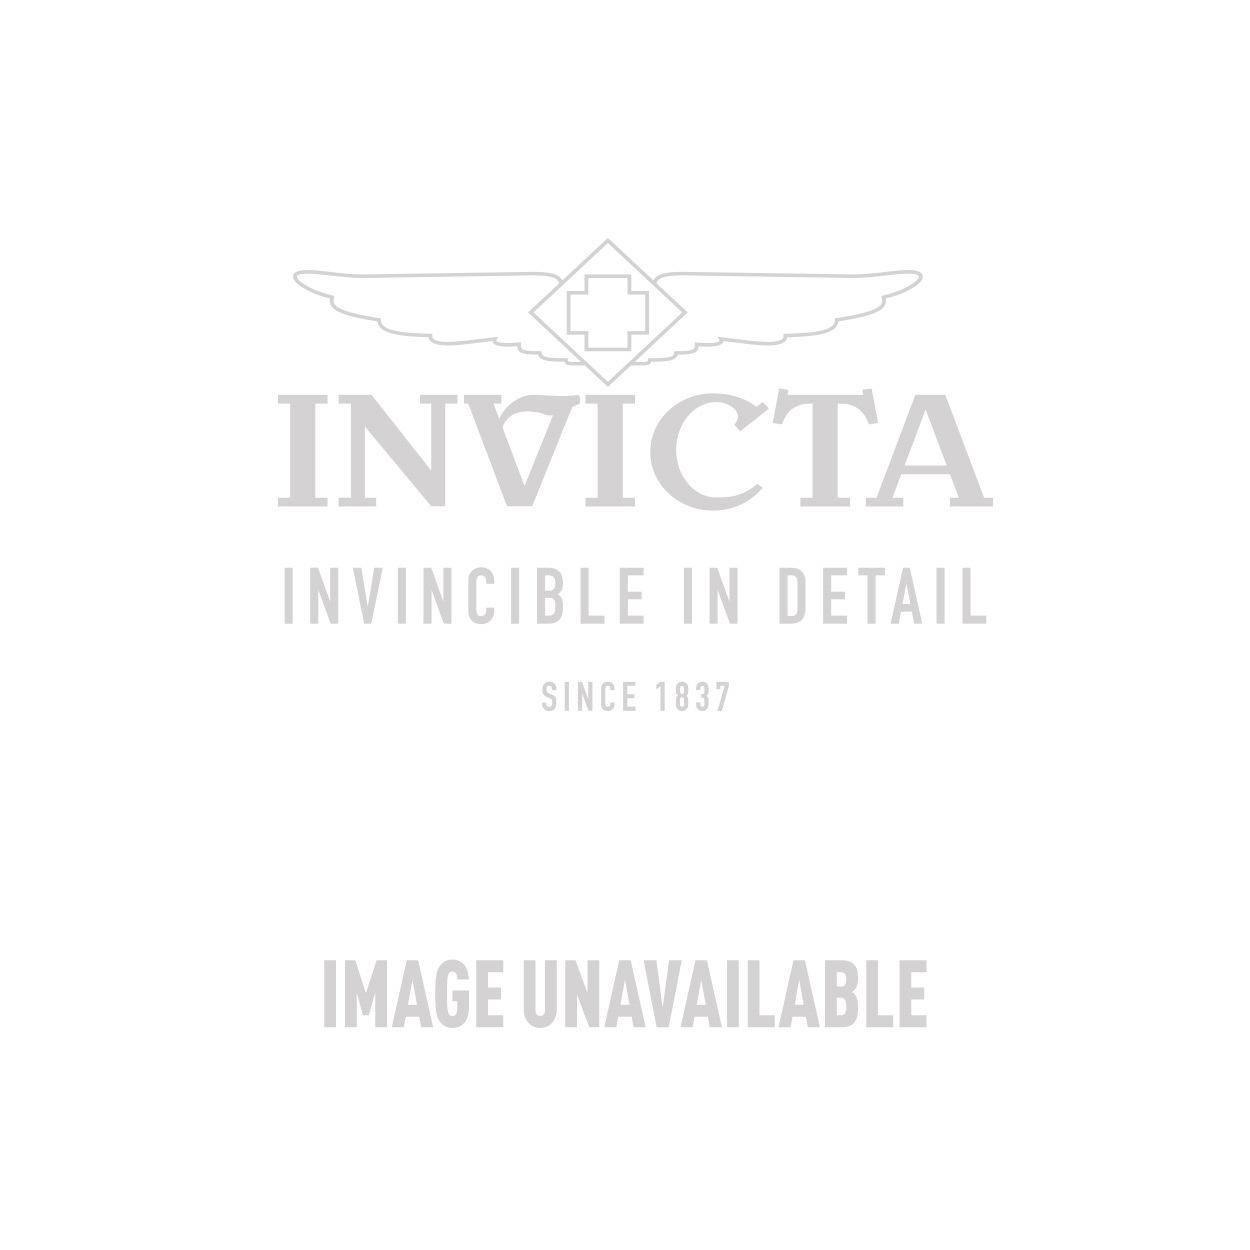 Invicta Pro Diver  Quartz Watch - Black case with Black, Red tone Polyurethane band - Model 11747